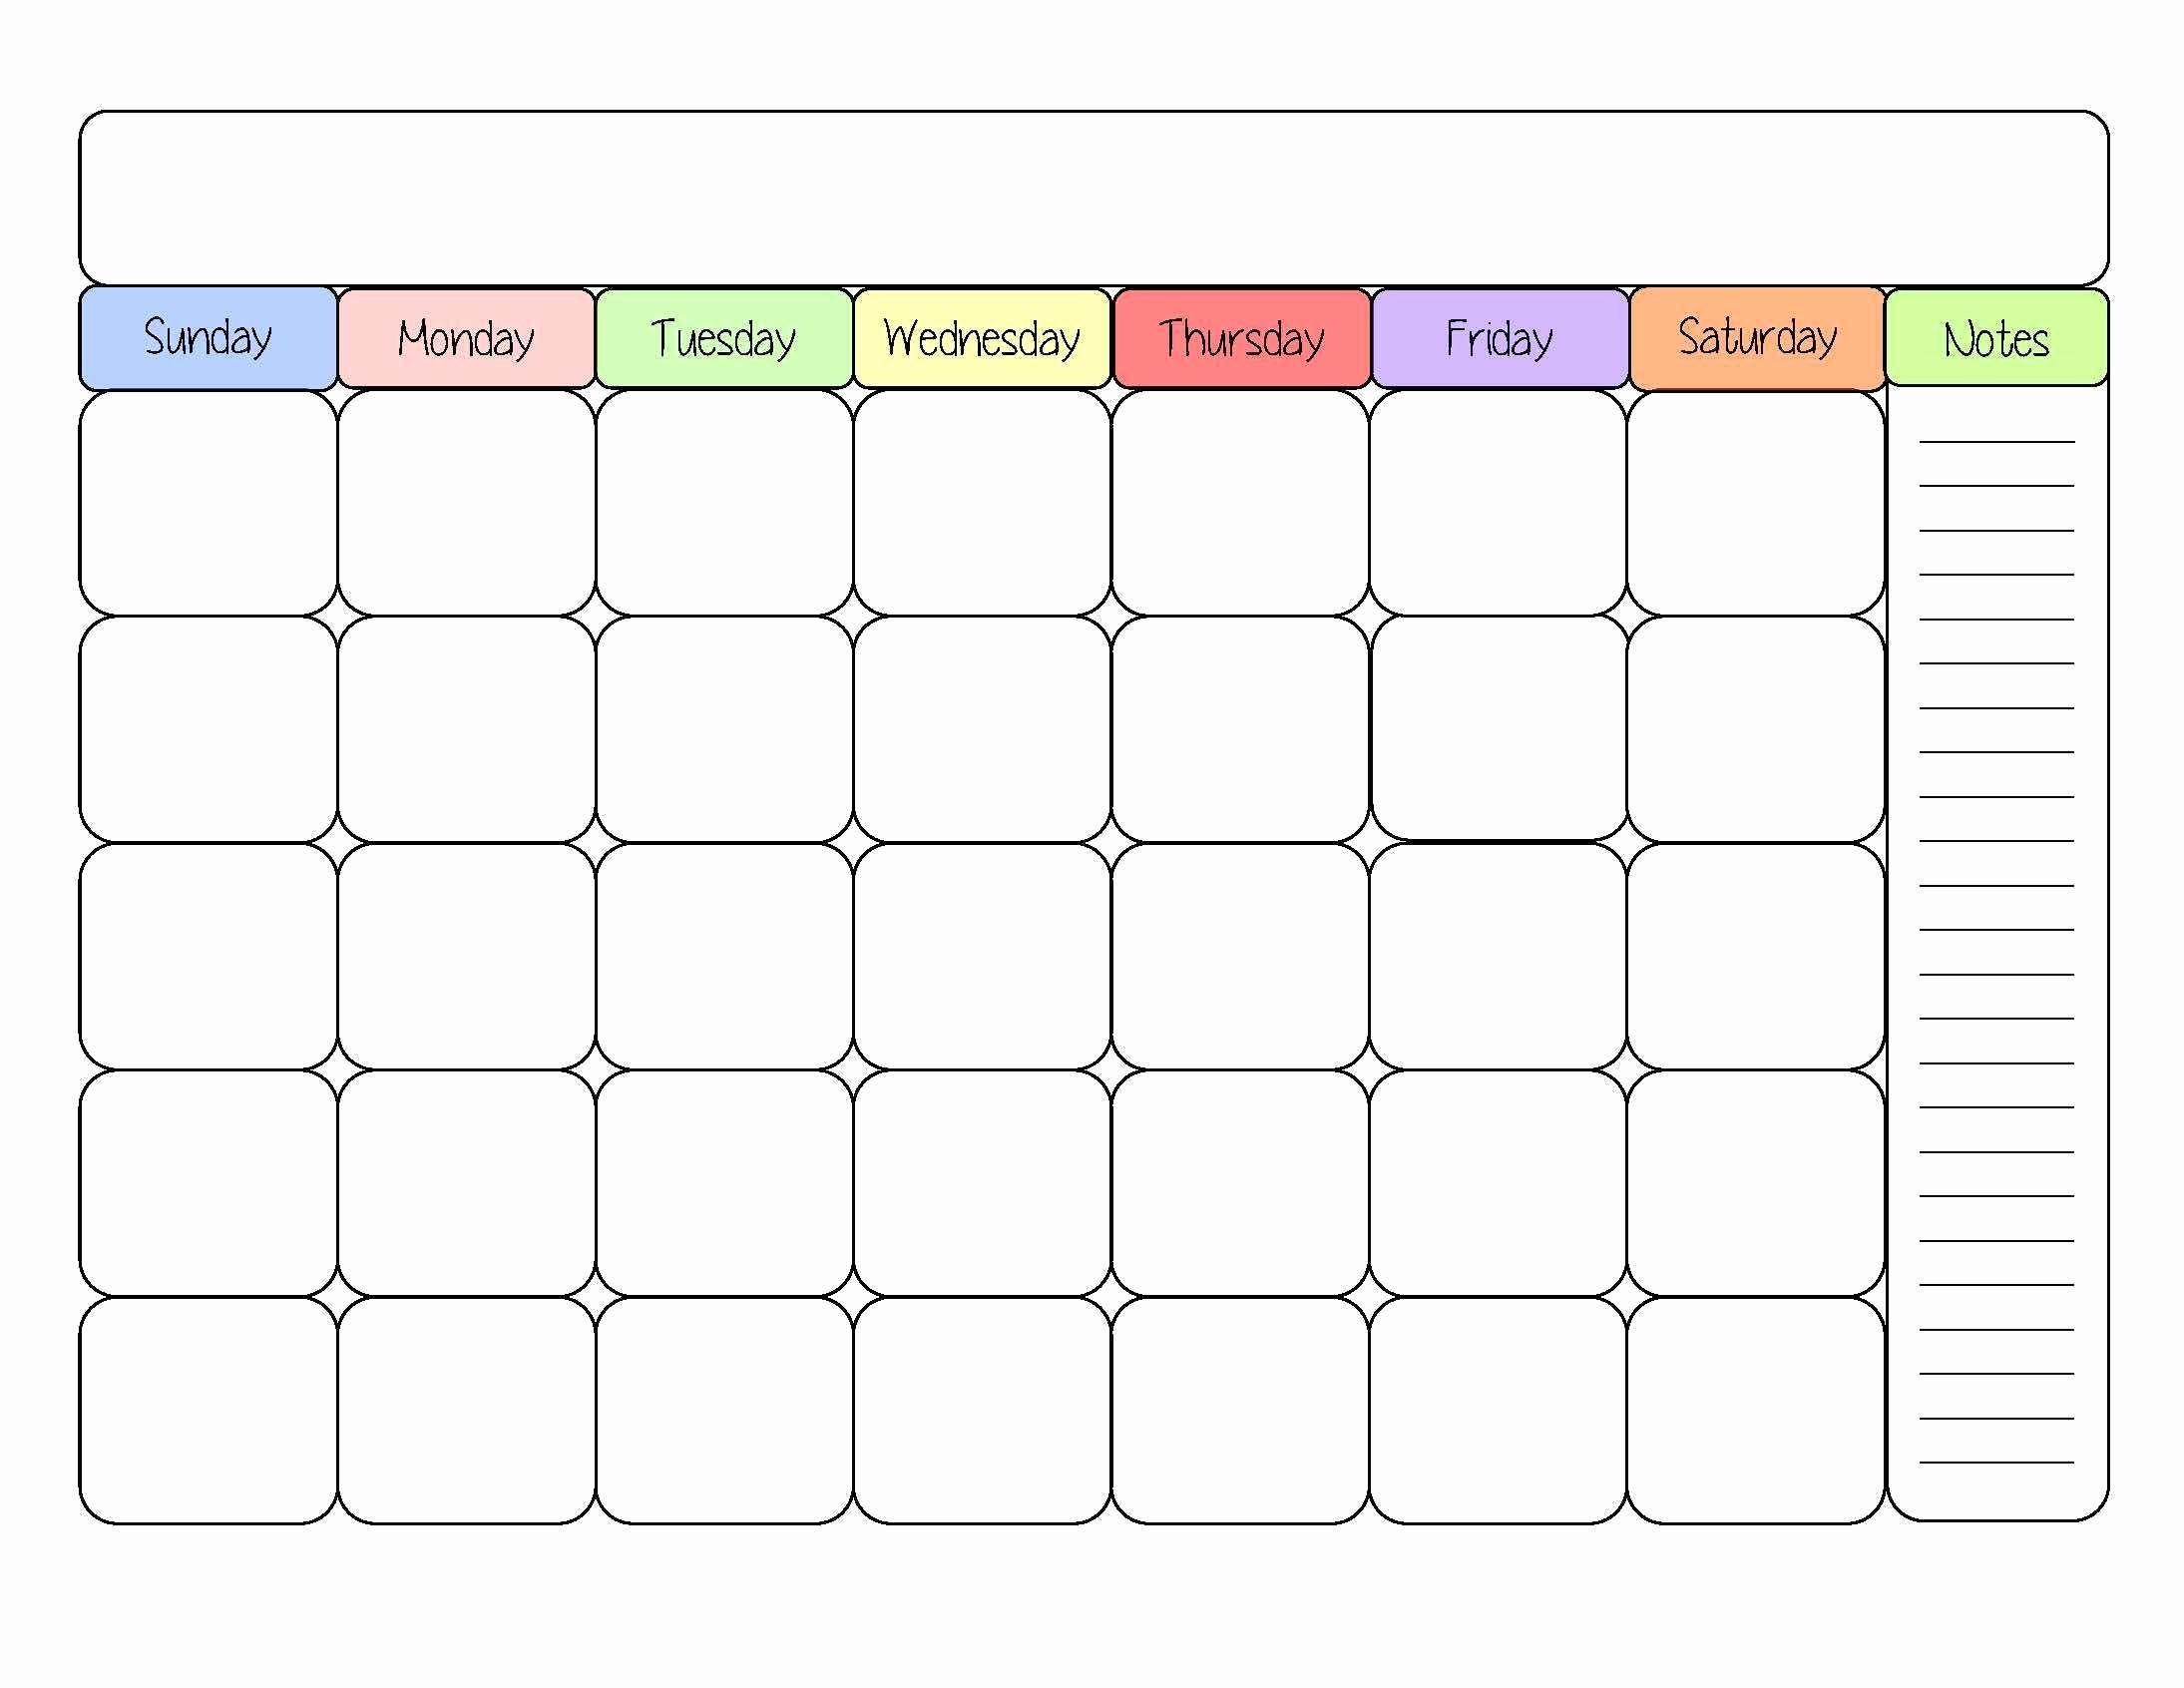 30 Day Calendar Template Word Fresh Printable 30 Day Calendar Baskanai